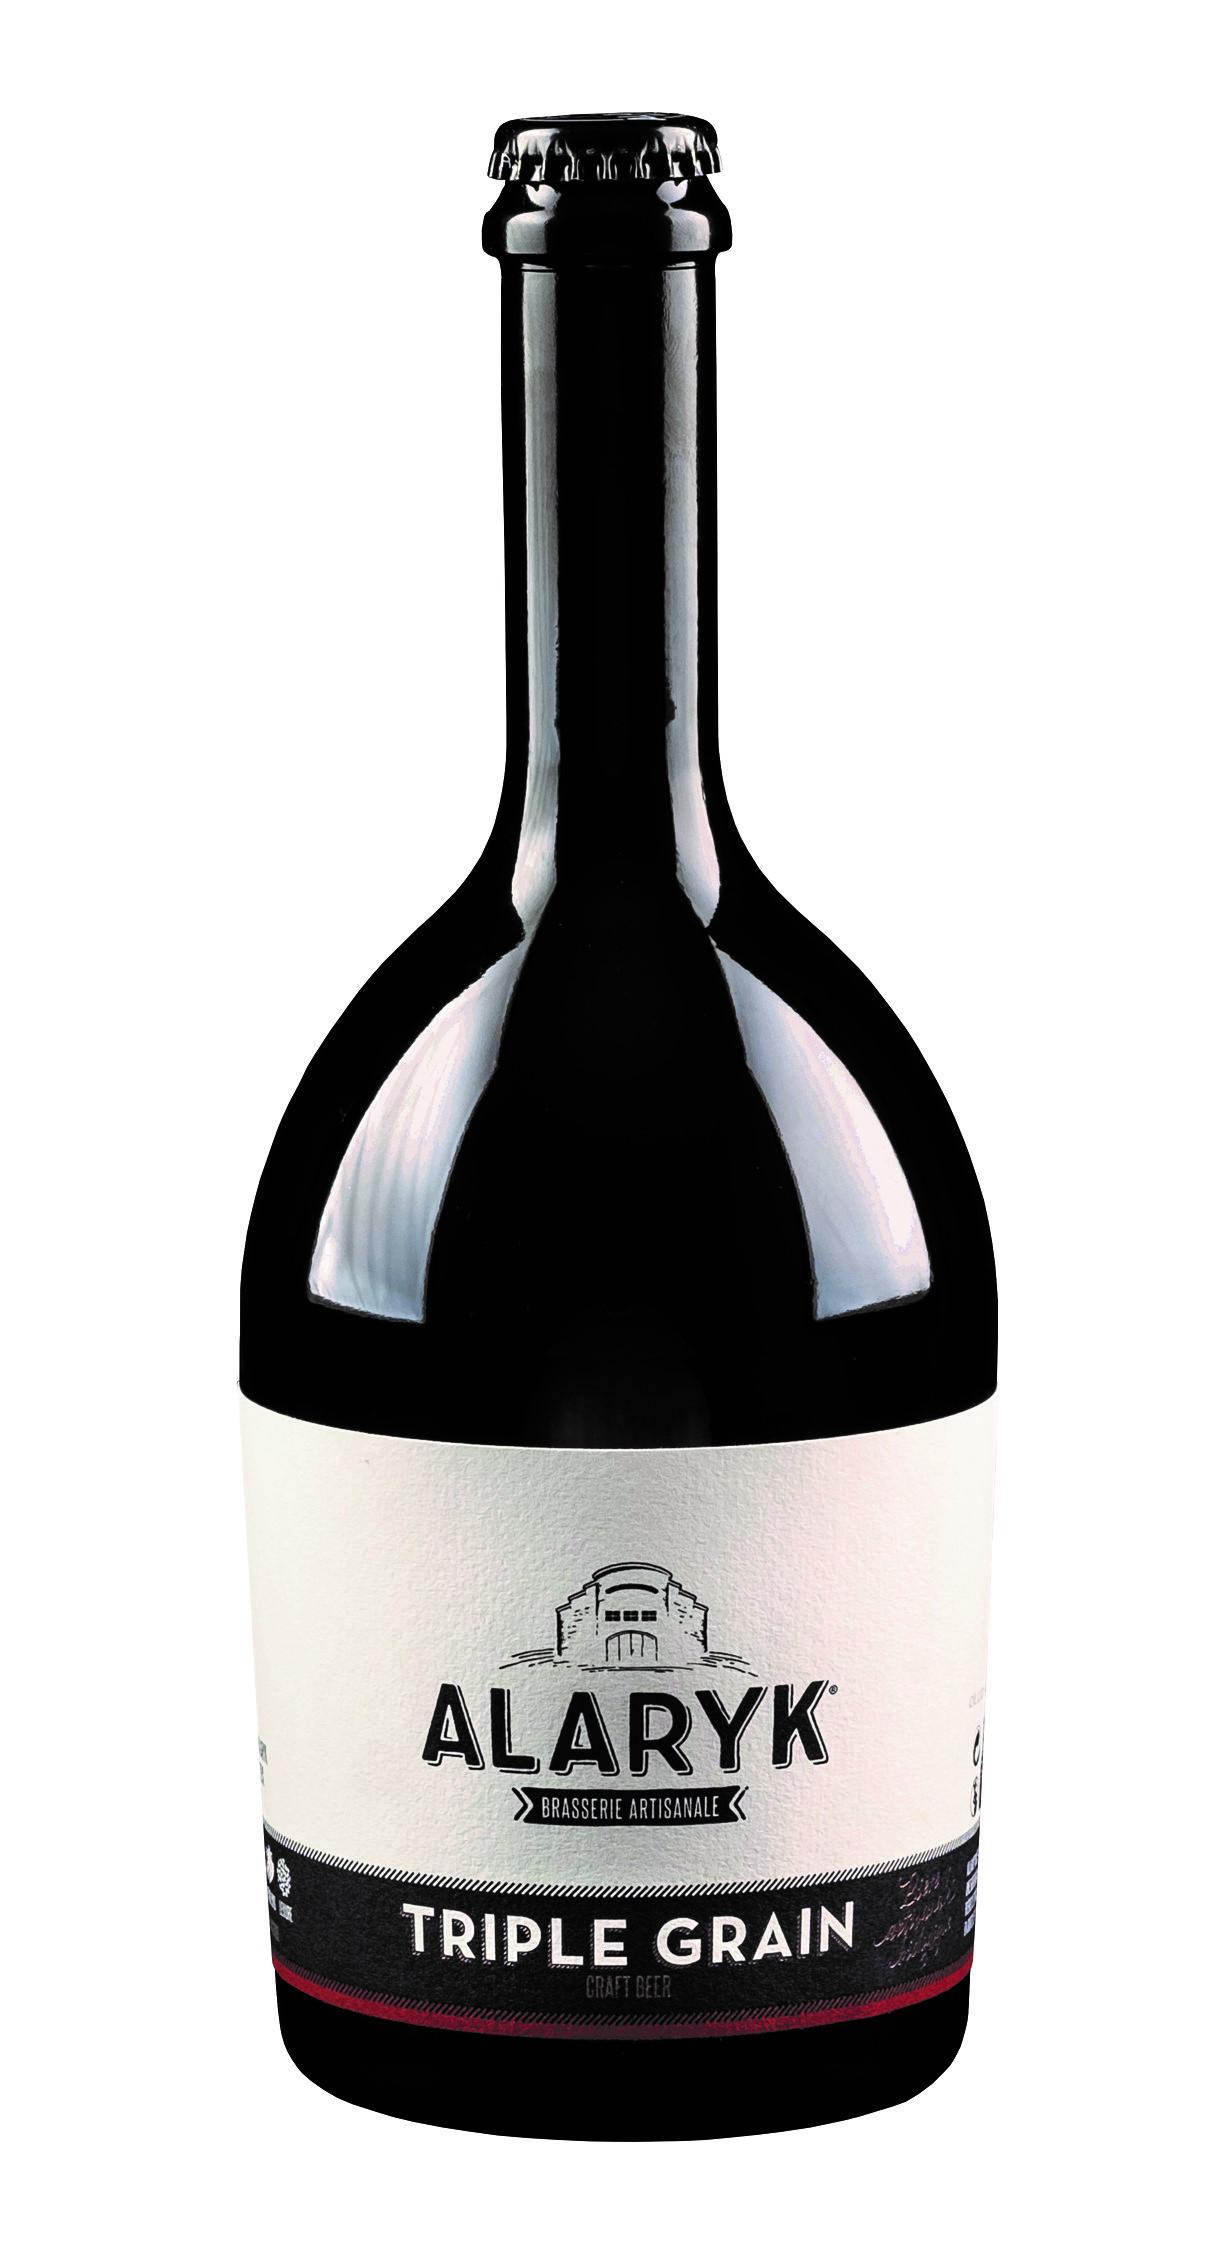 Cervesa Alaryk Triple Grain Bio 8,5% vol. 33cl.